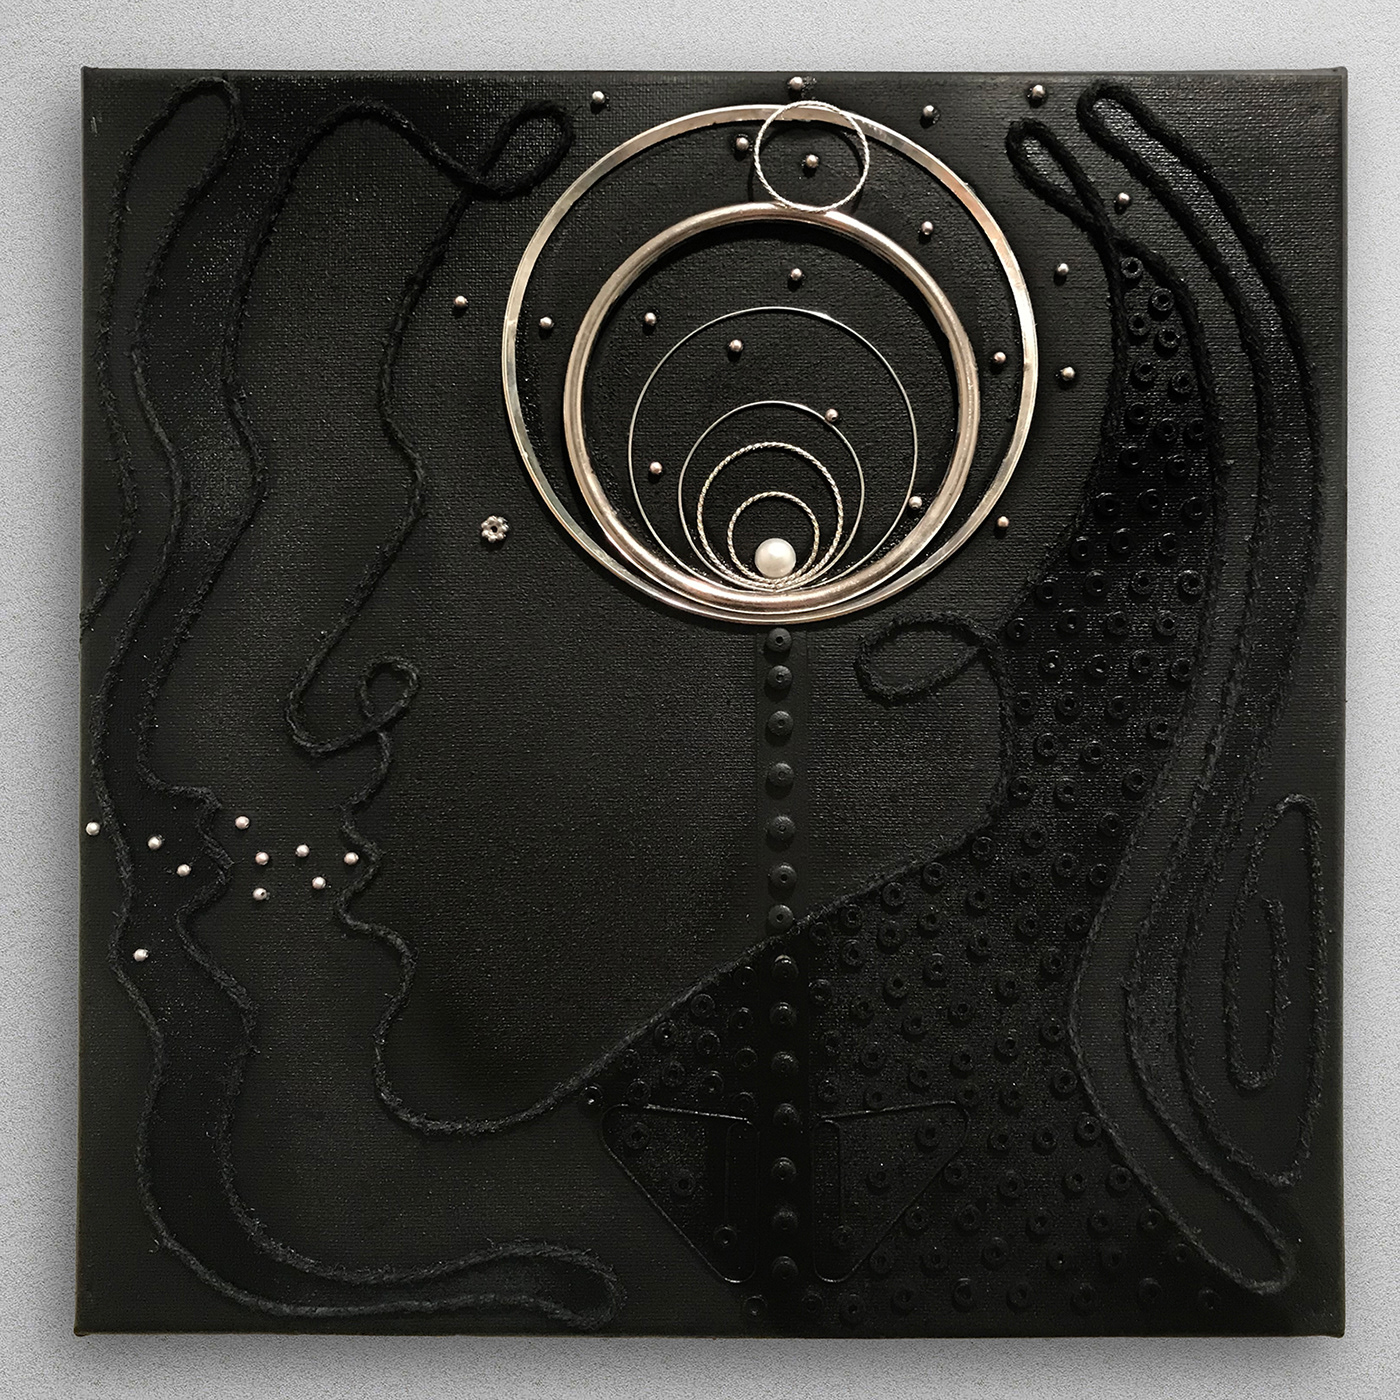 malware,Face Recognition,Dystopian,conceptual art,black and white,self-portrait,privacy,contemporary art,Samuel Gomez,Samuel Gomez Art